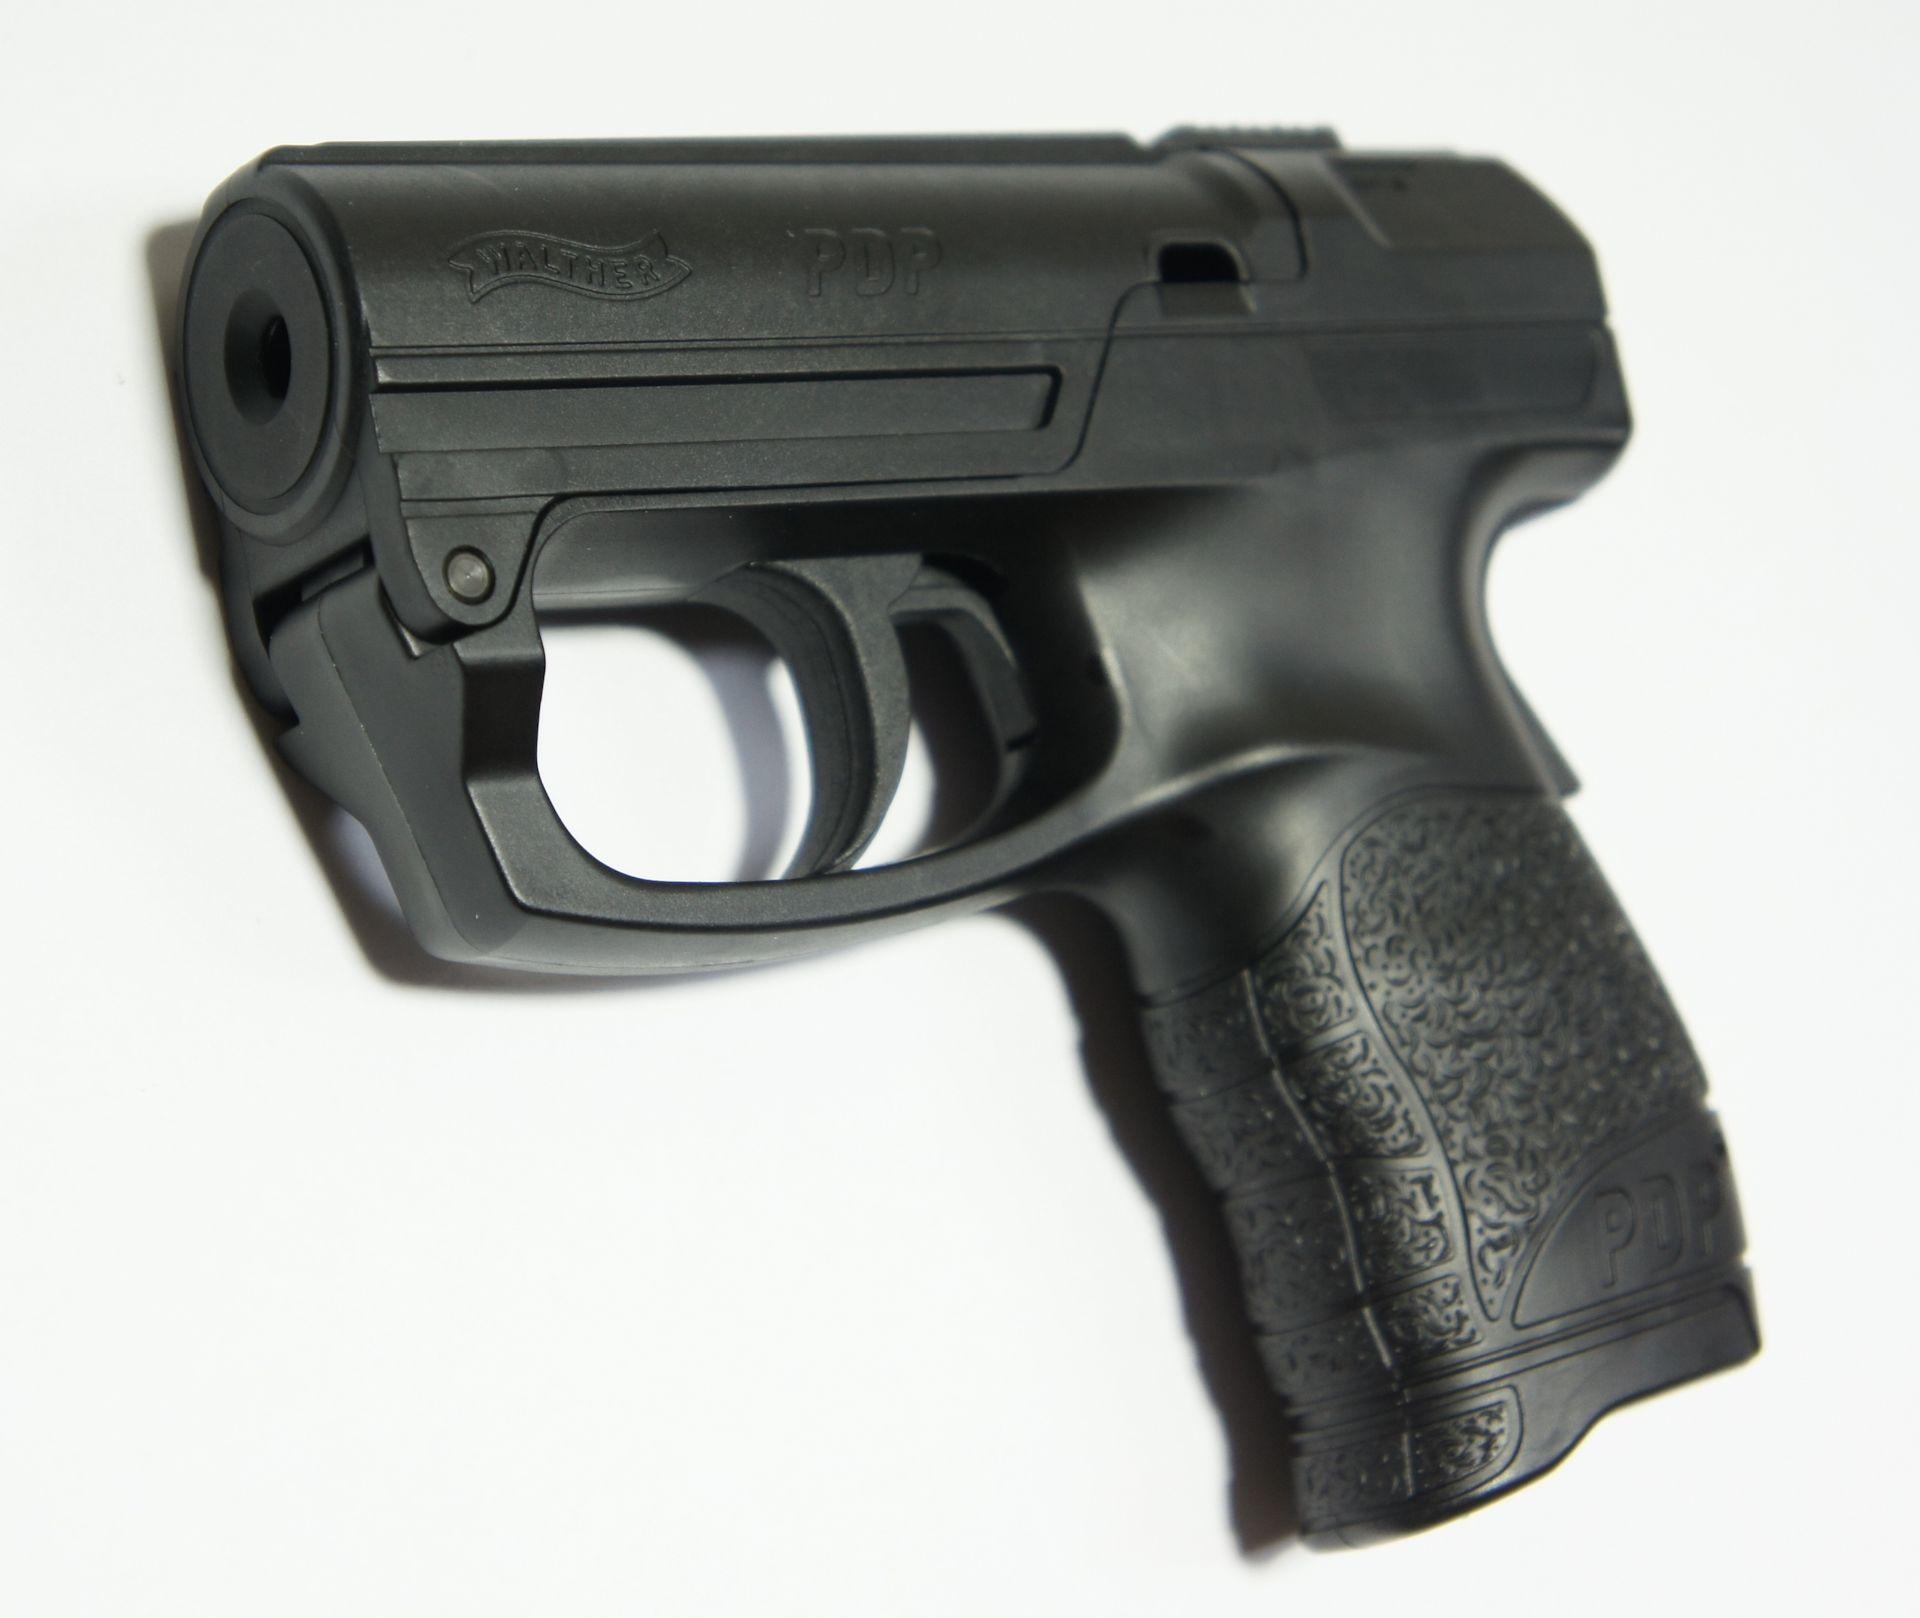 Walther PDP Sprühgerät in schwarz